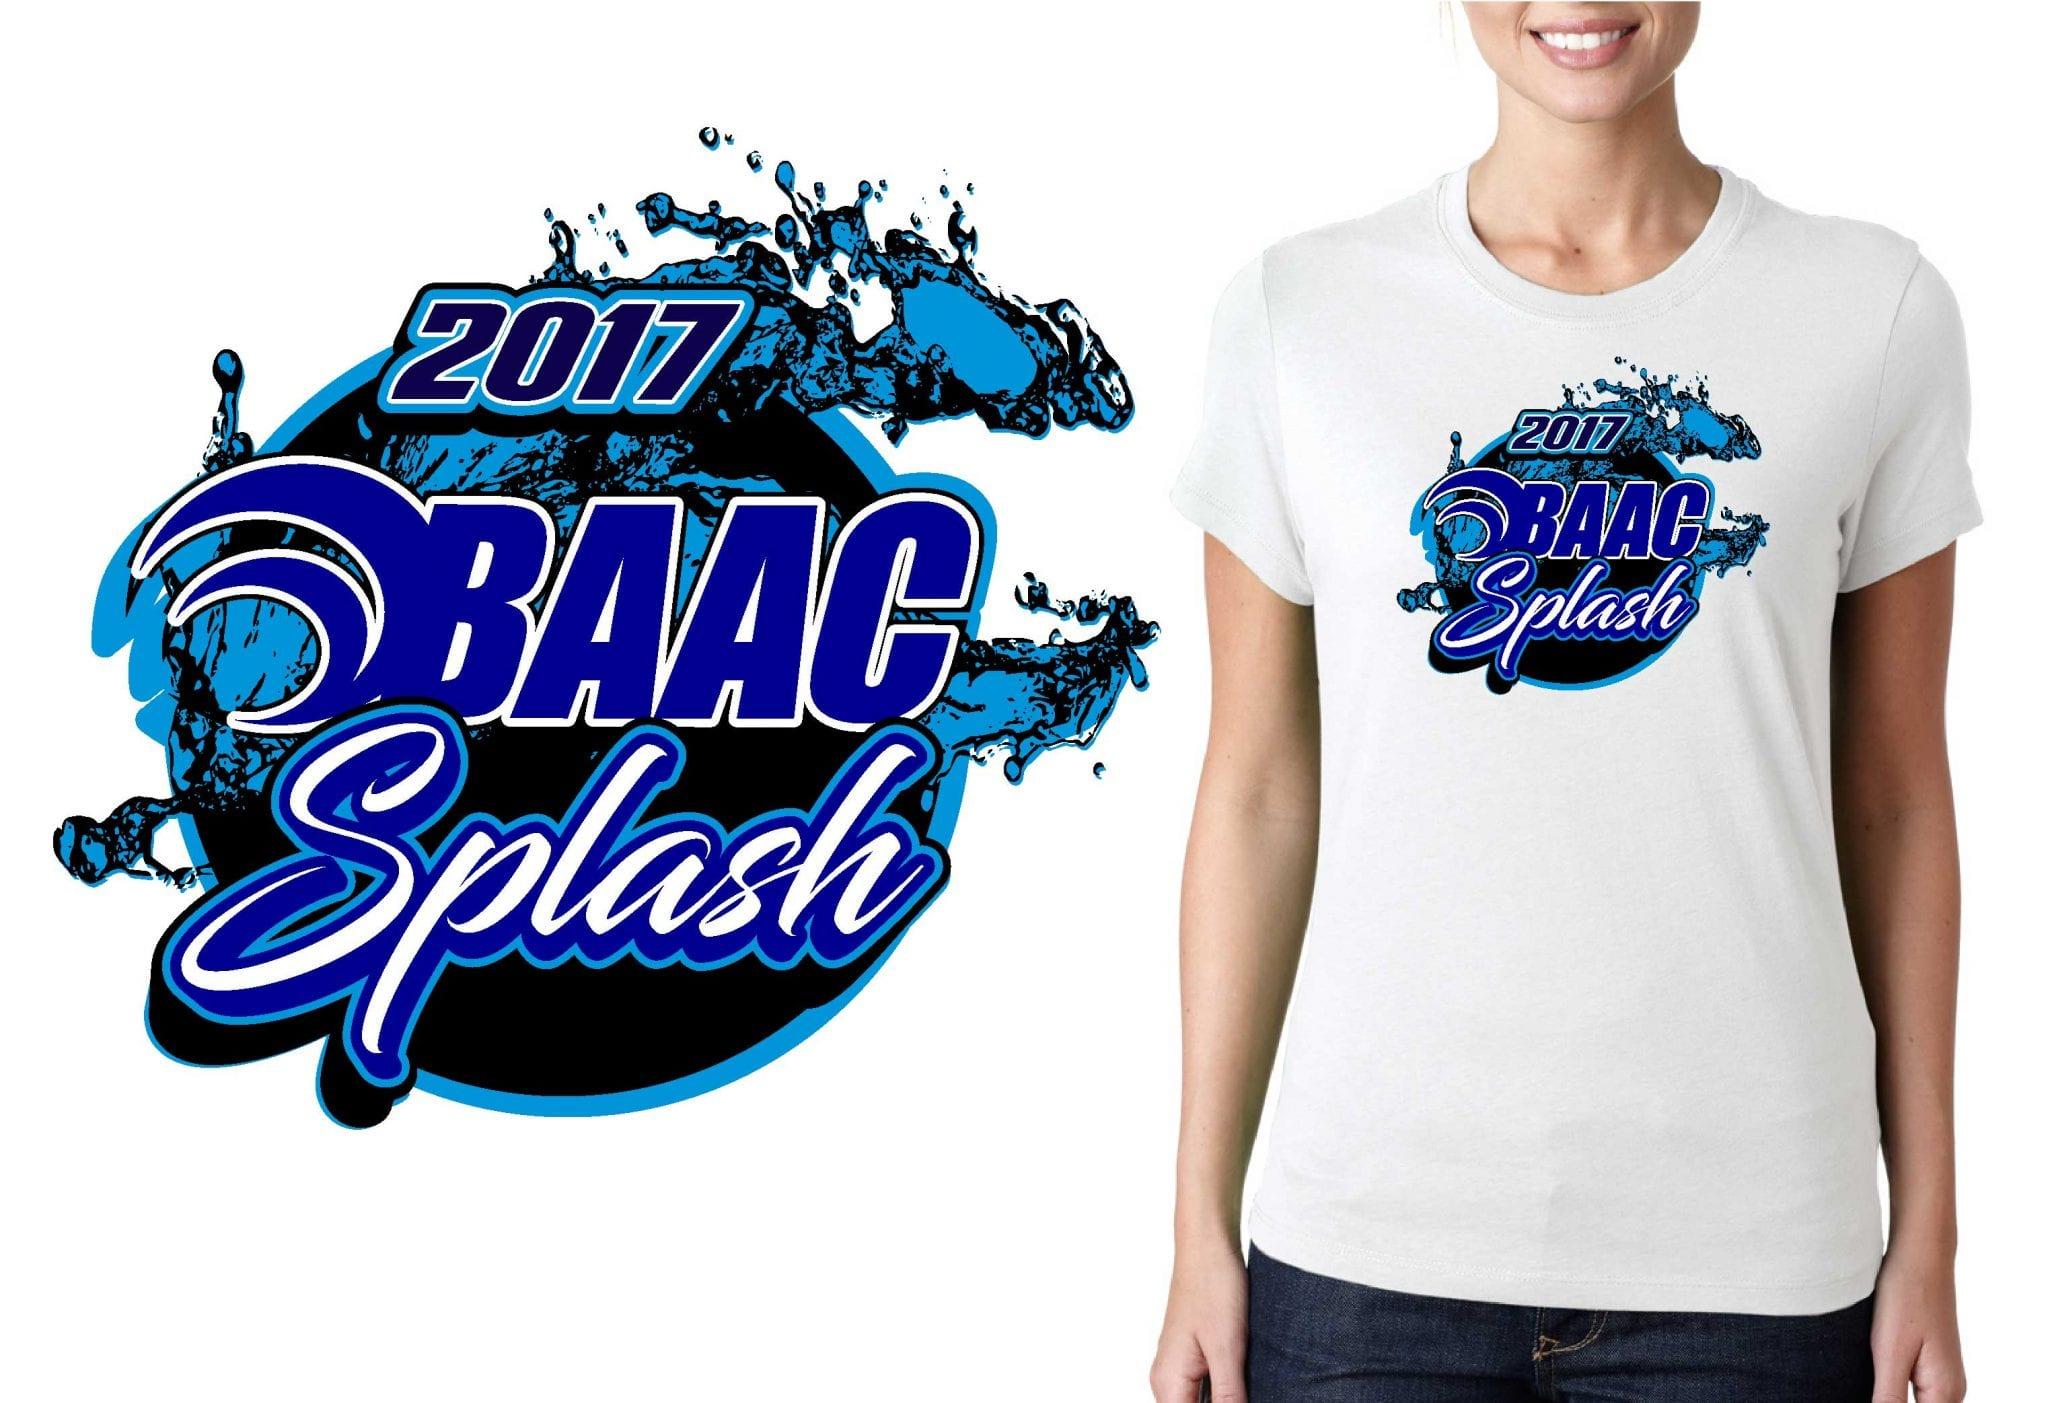 2017 BAAC Swim Meet vector logo design for swimming t-shirt UrArtStudio